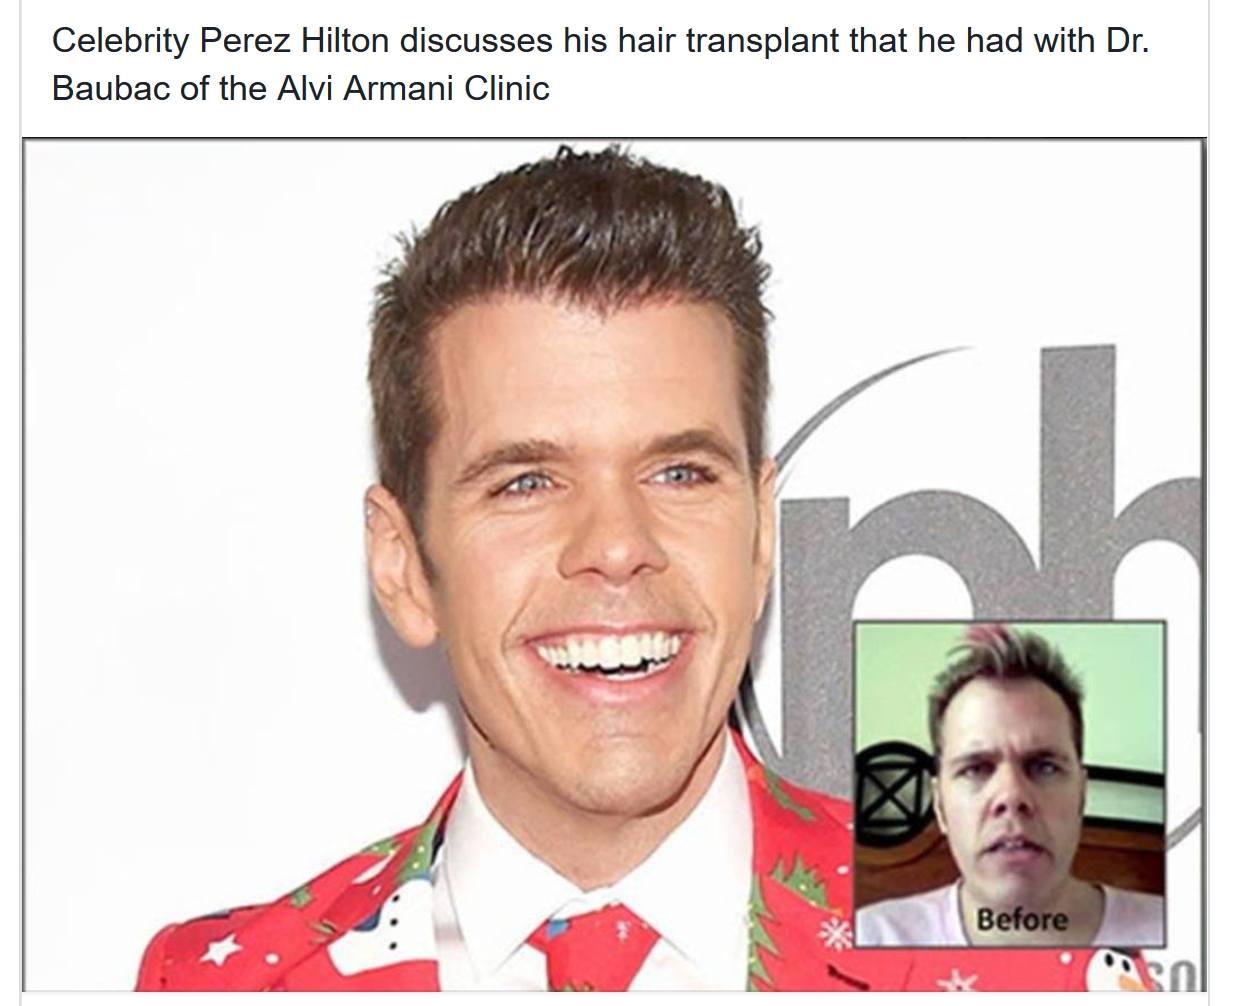 Perez Hilton Hair Transplant Results with Dr. Baubac